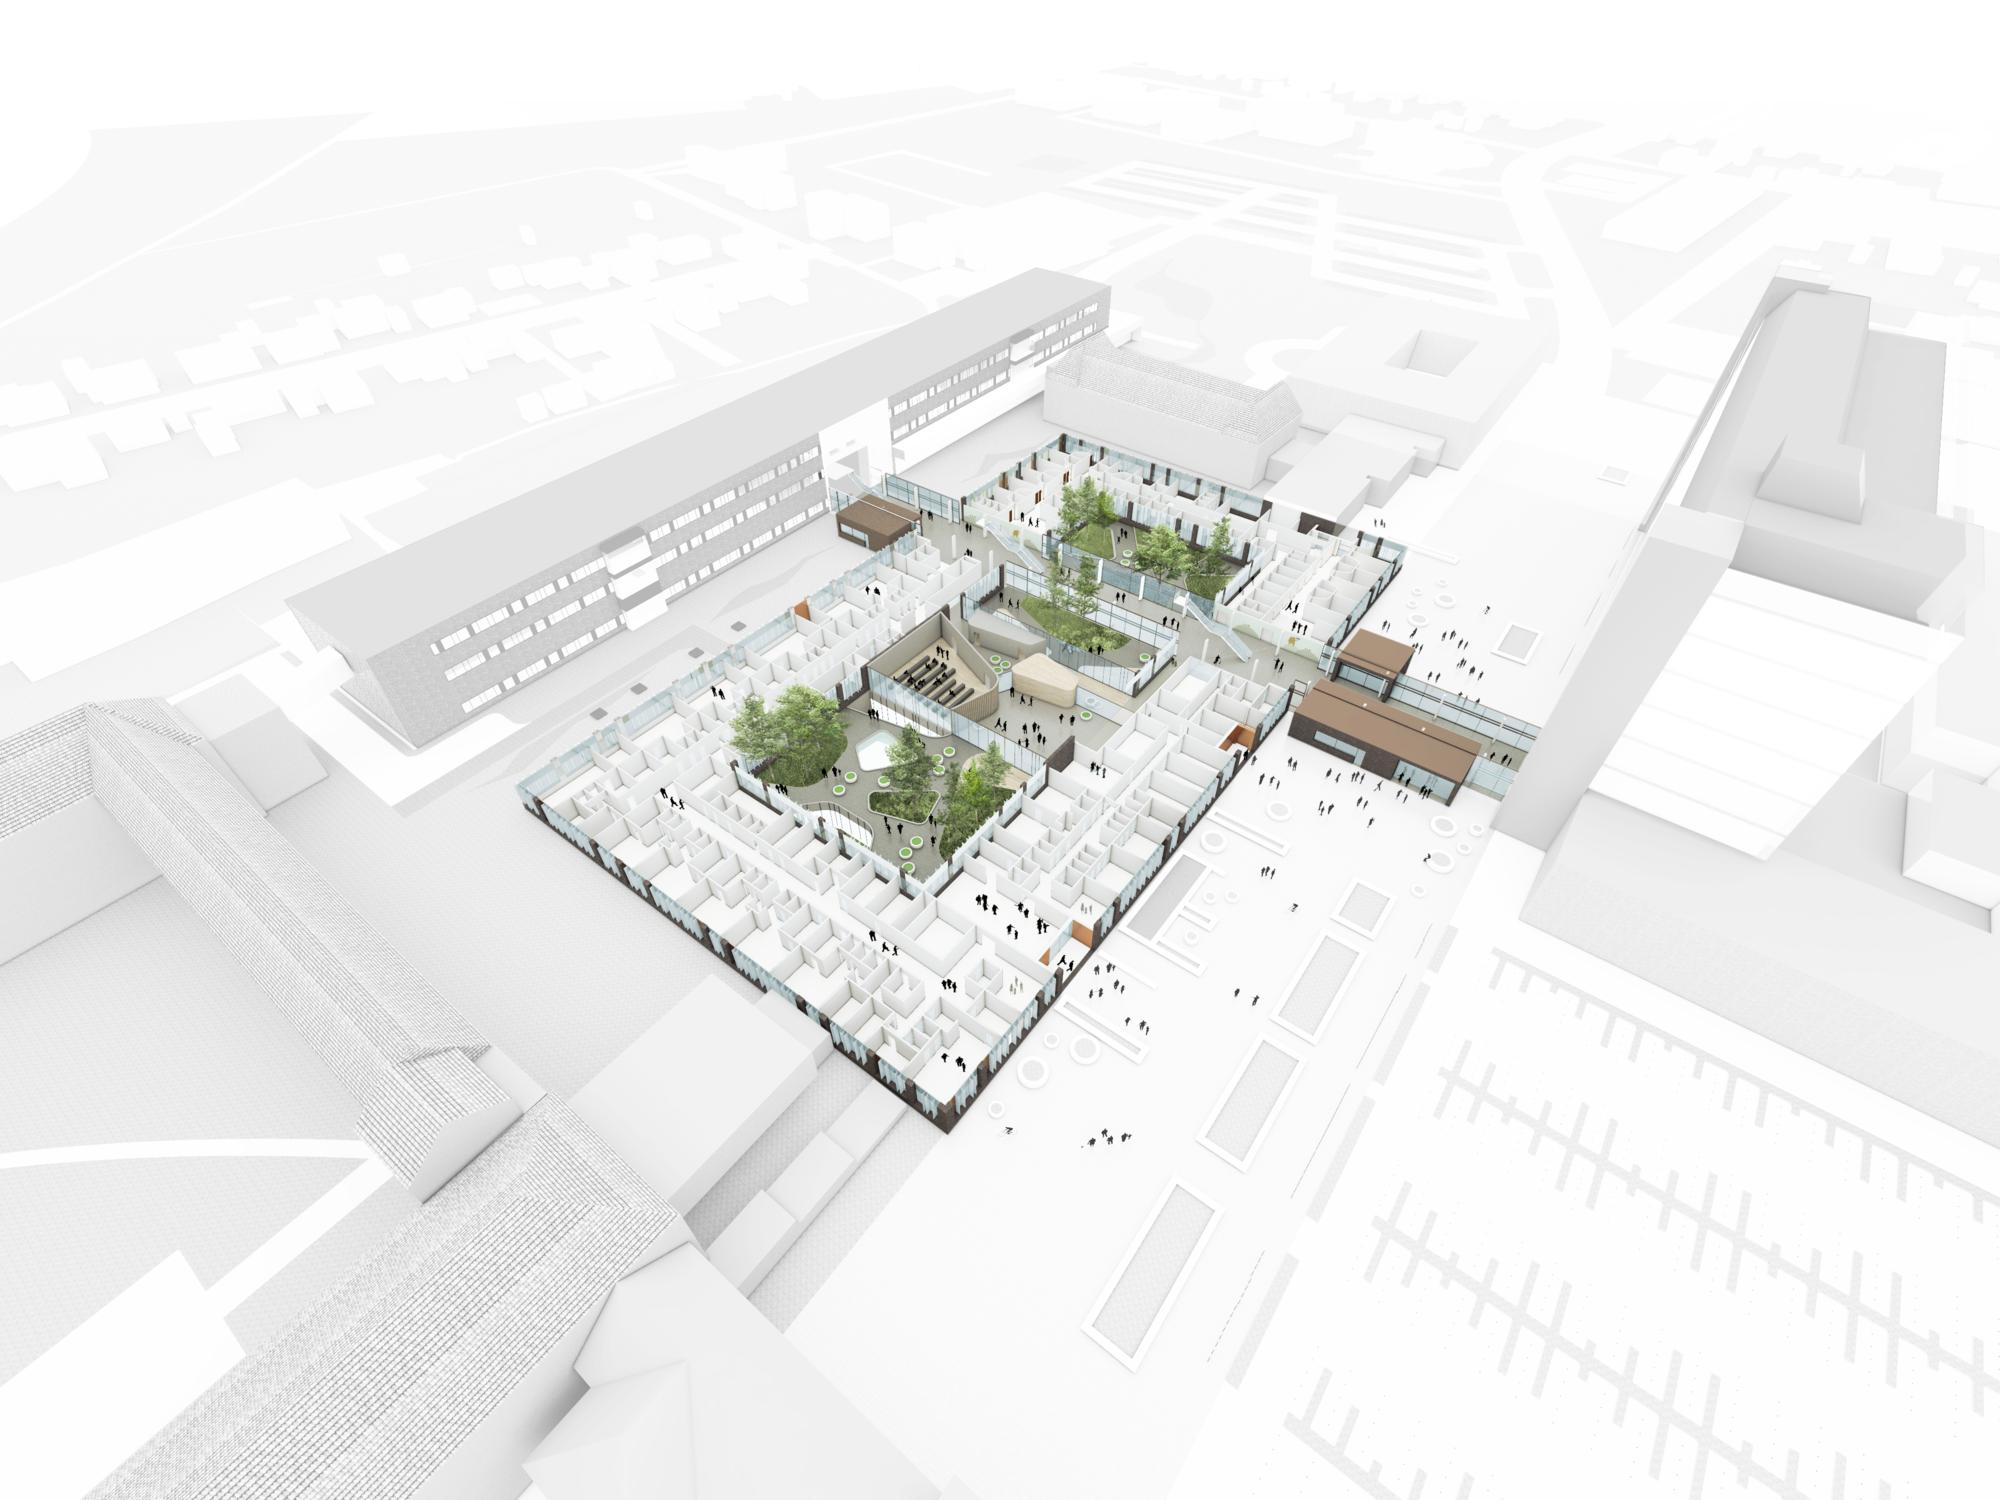 C.F. Møller Wins Vendsyssel Hospital Competition,Ground Floor Cutaway. Image © C.F. Møller